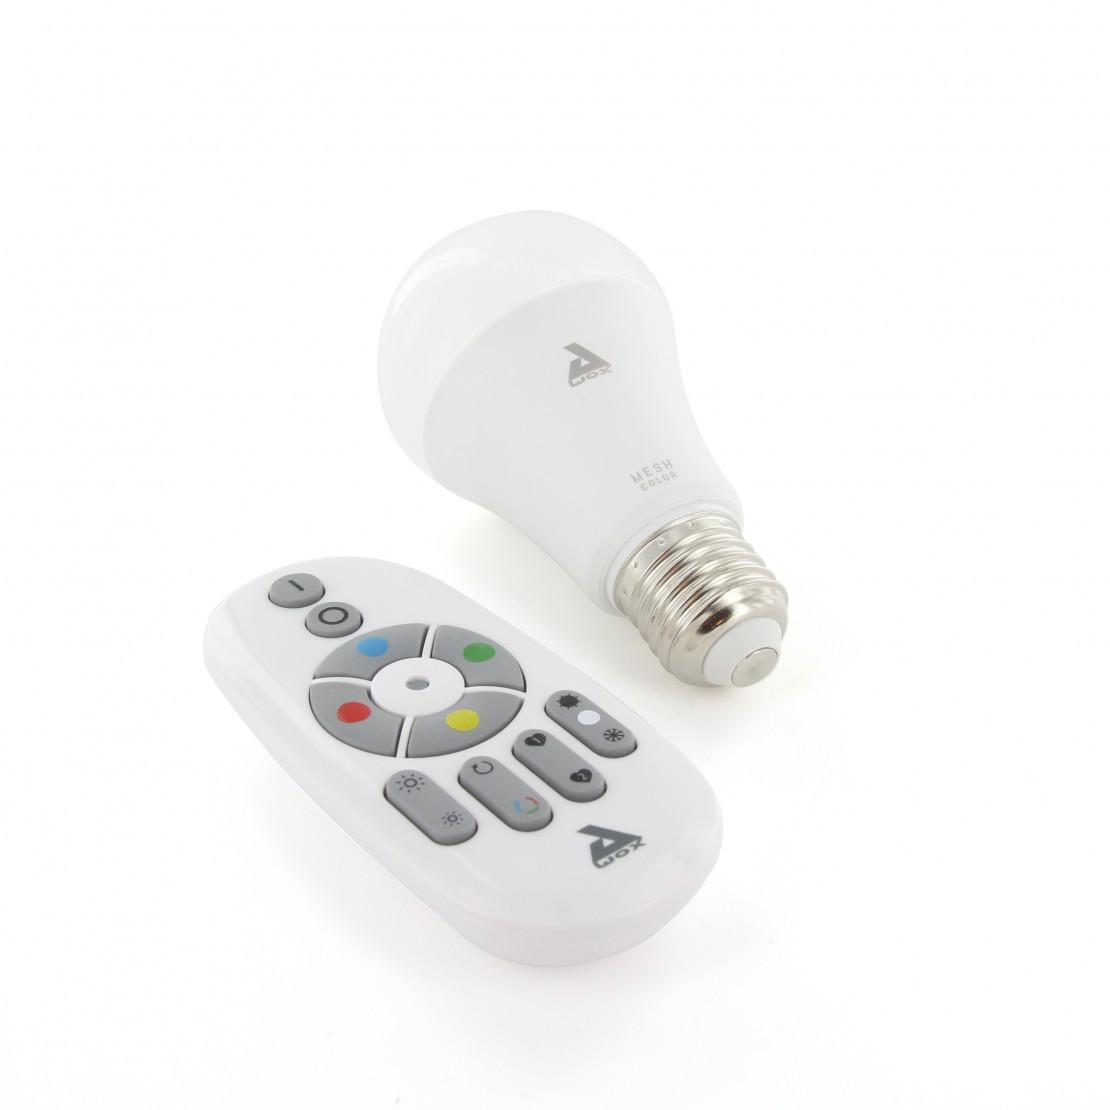 Kit de bombilla E27 color Bluetooth Mesh y mando a distancia